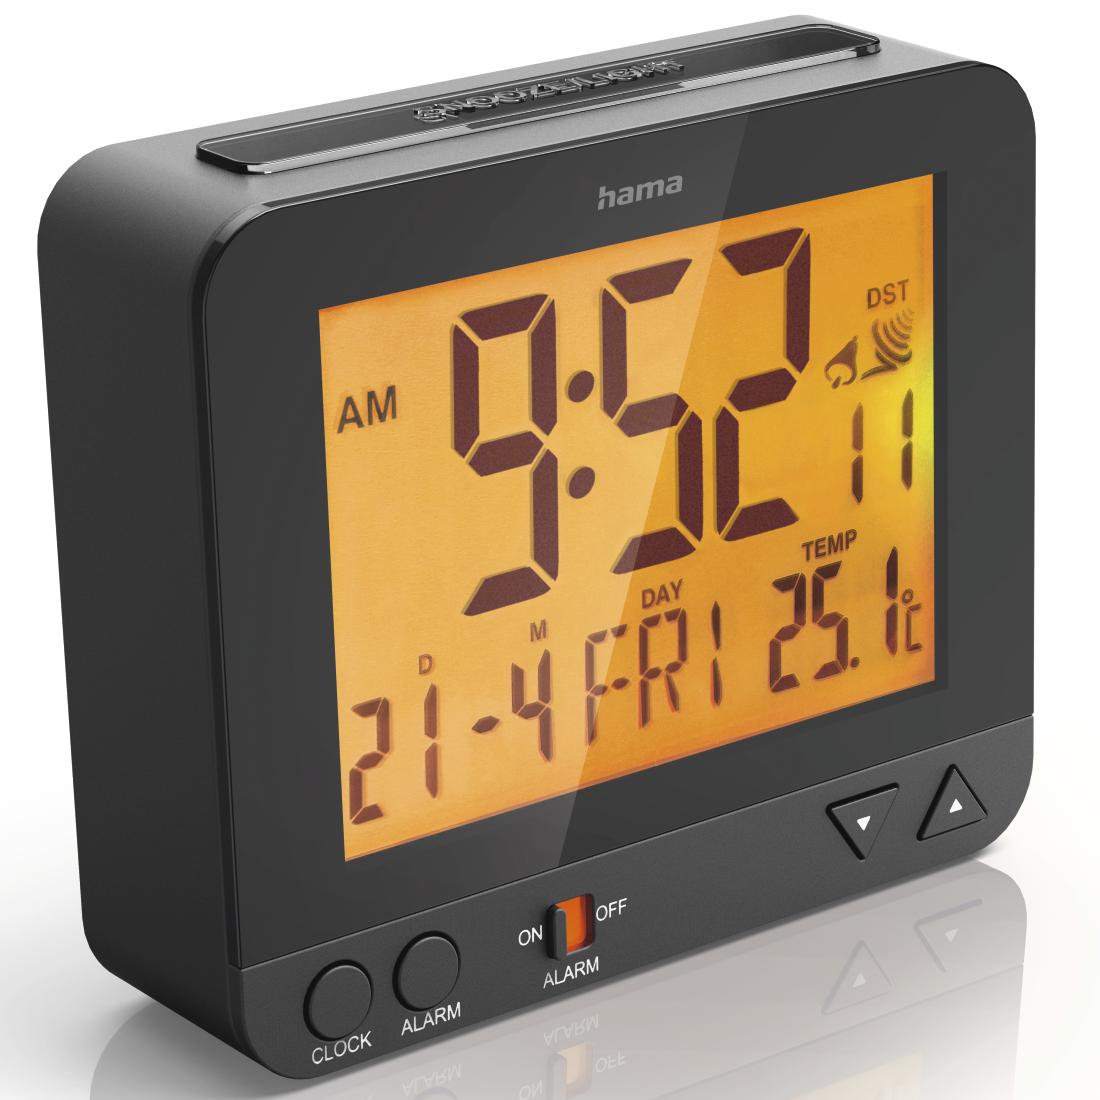 00113966 Hama Rc 550 Radio Controlled Alarm Clock With Night Lamp Light Function